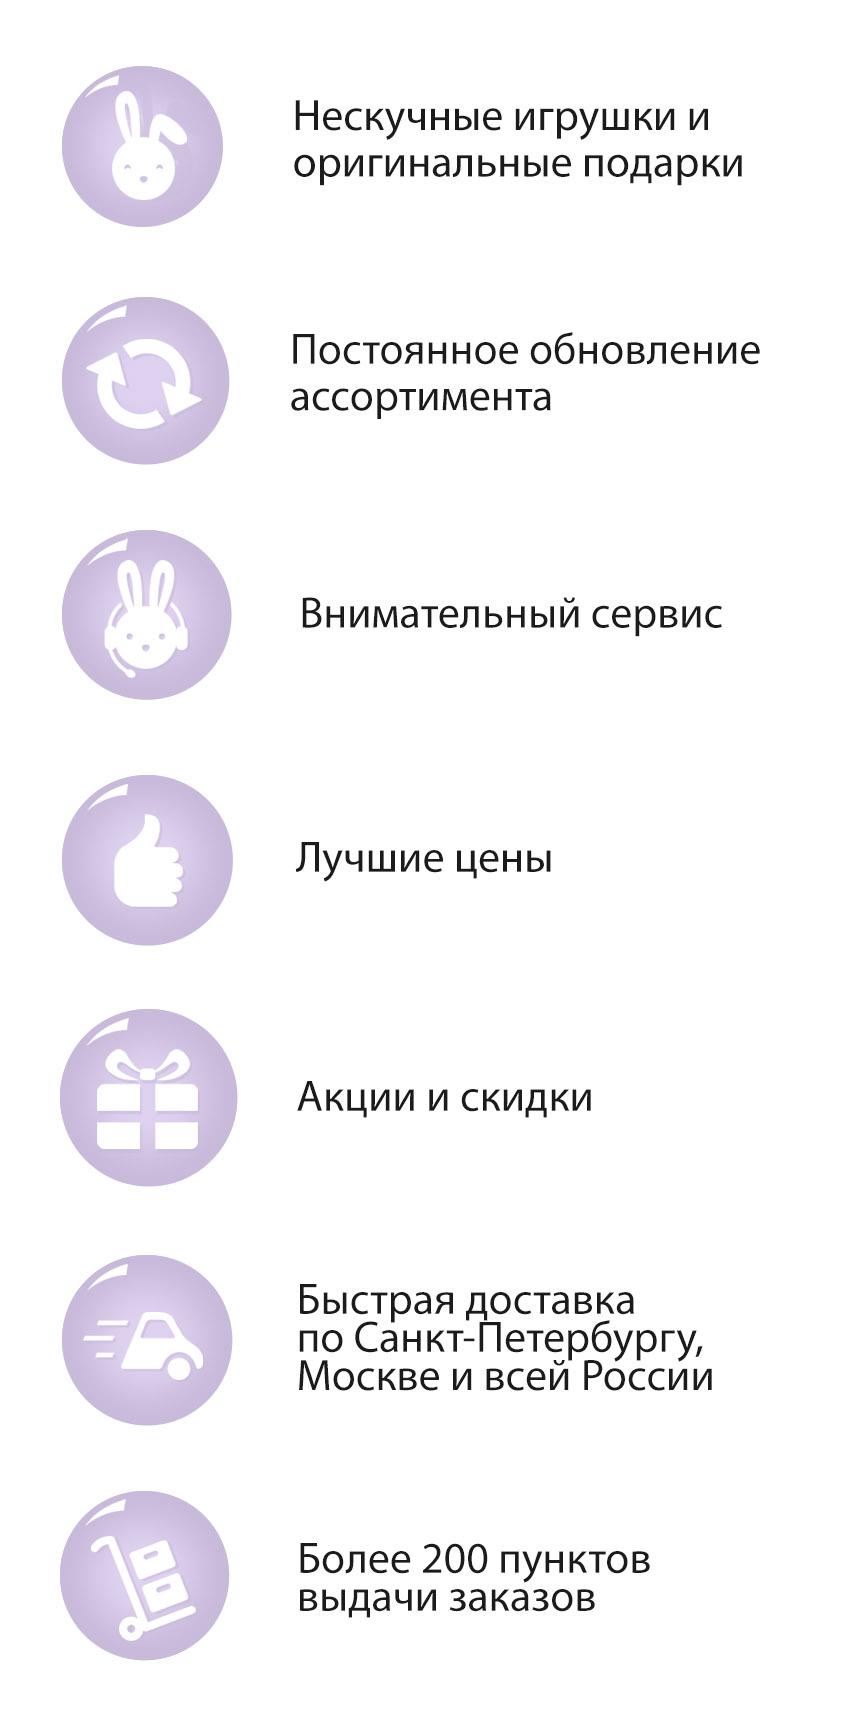 ikonki_mimi6.jpg